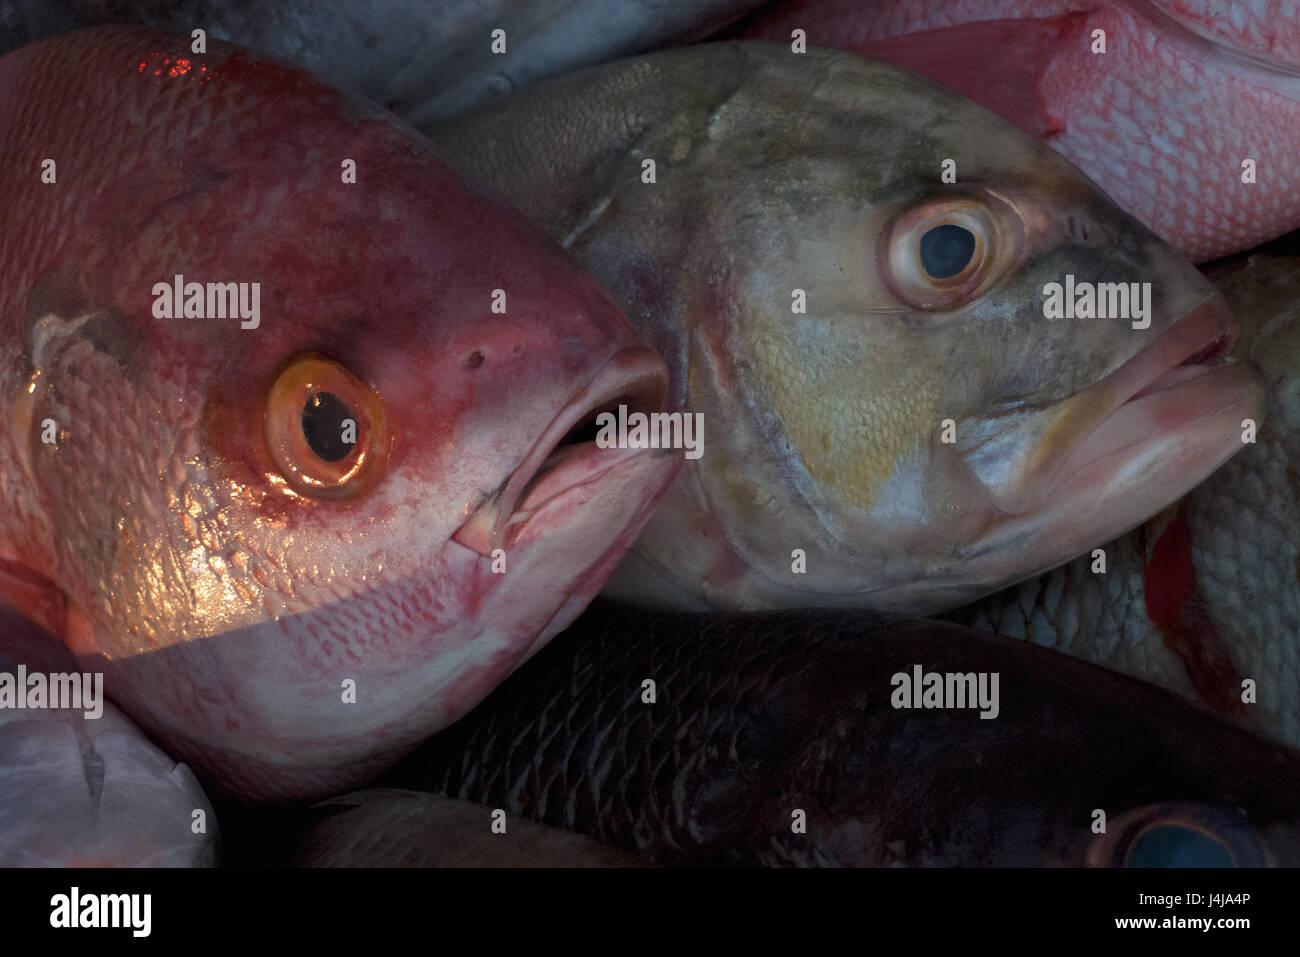 fish bulging eyes stockfotos fish bulging eyes bilder. Black Bedroom Furniture Sets. Home Design Ideas